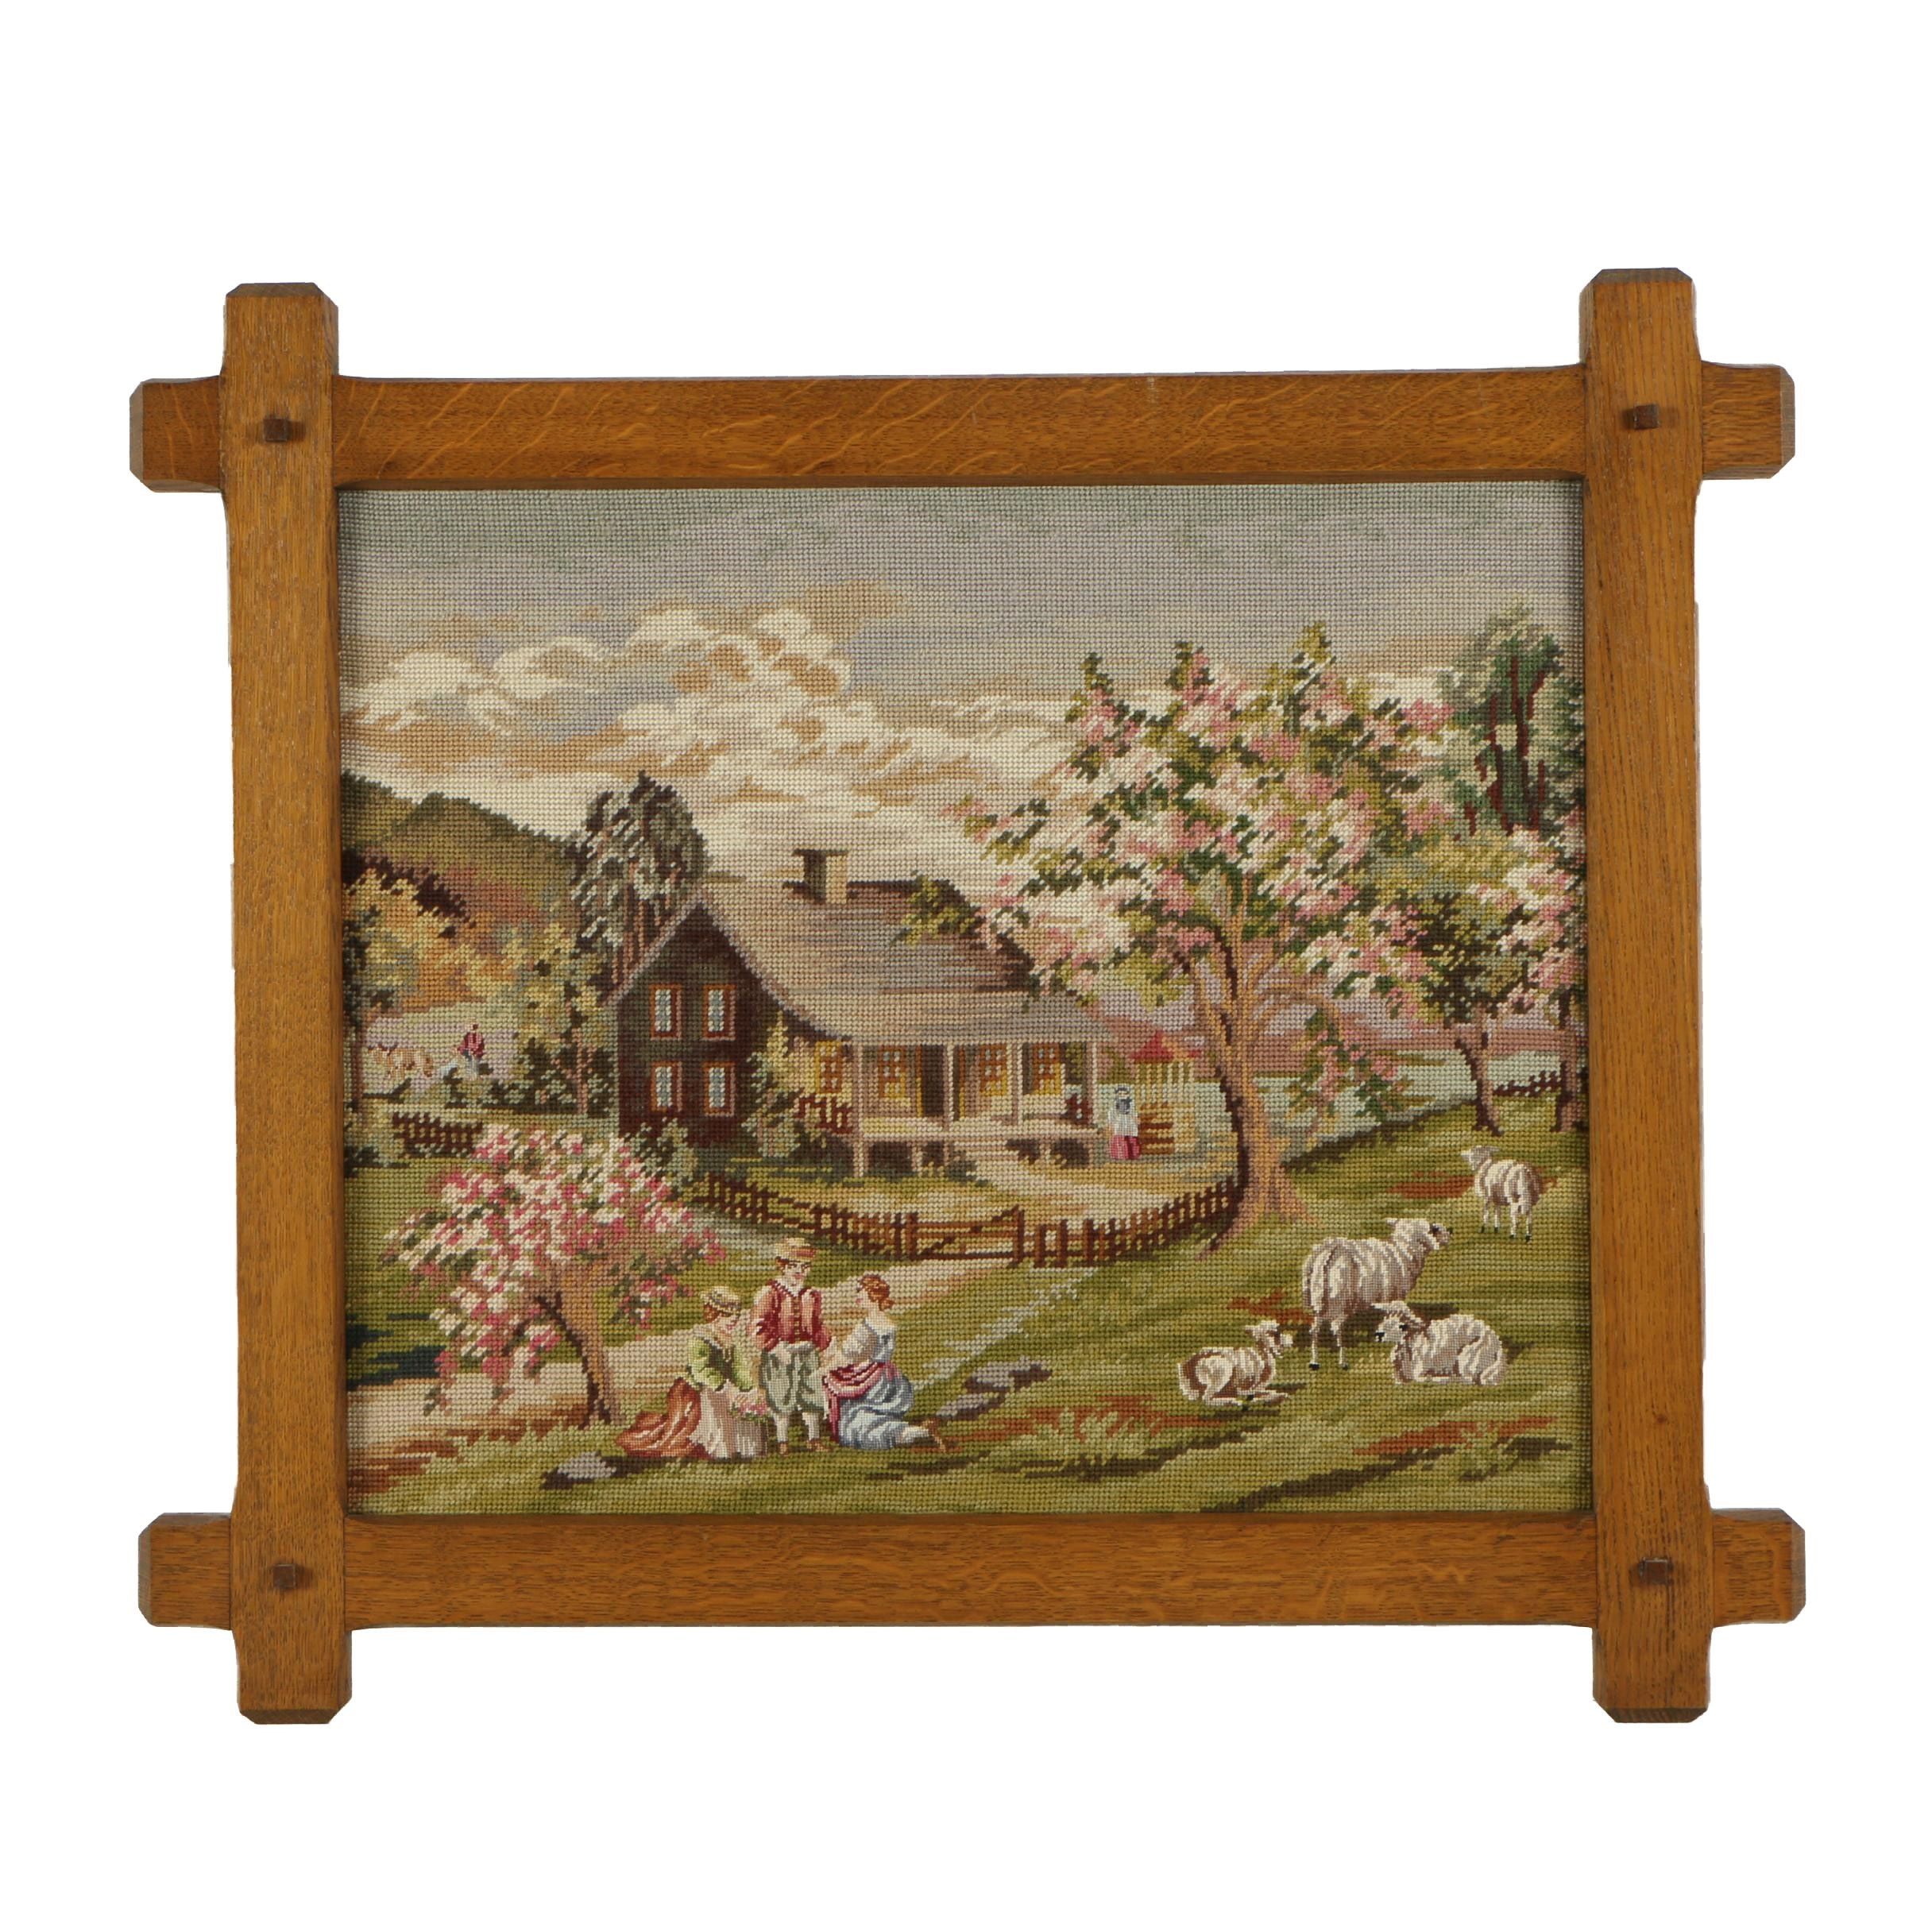 Needlepoint Embroidery of Farm Landscape